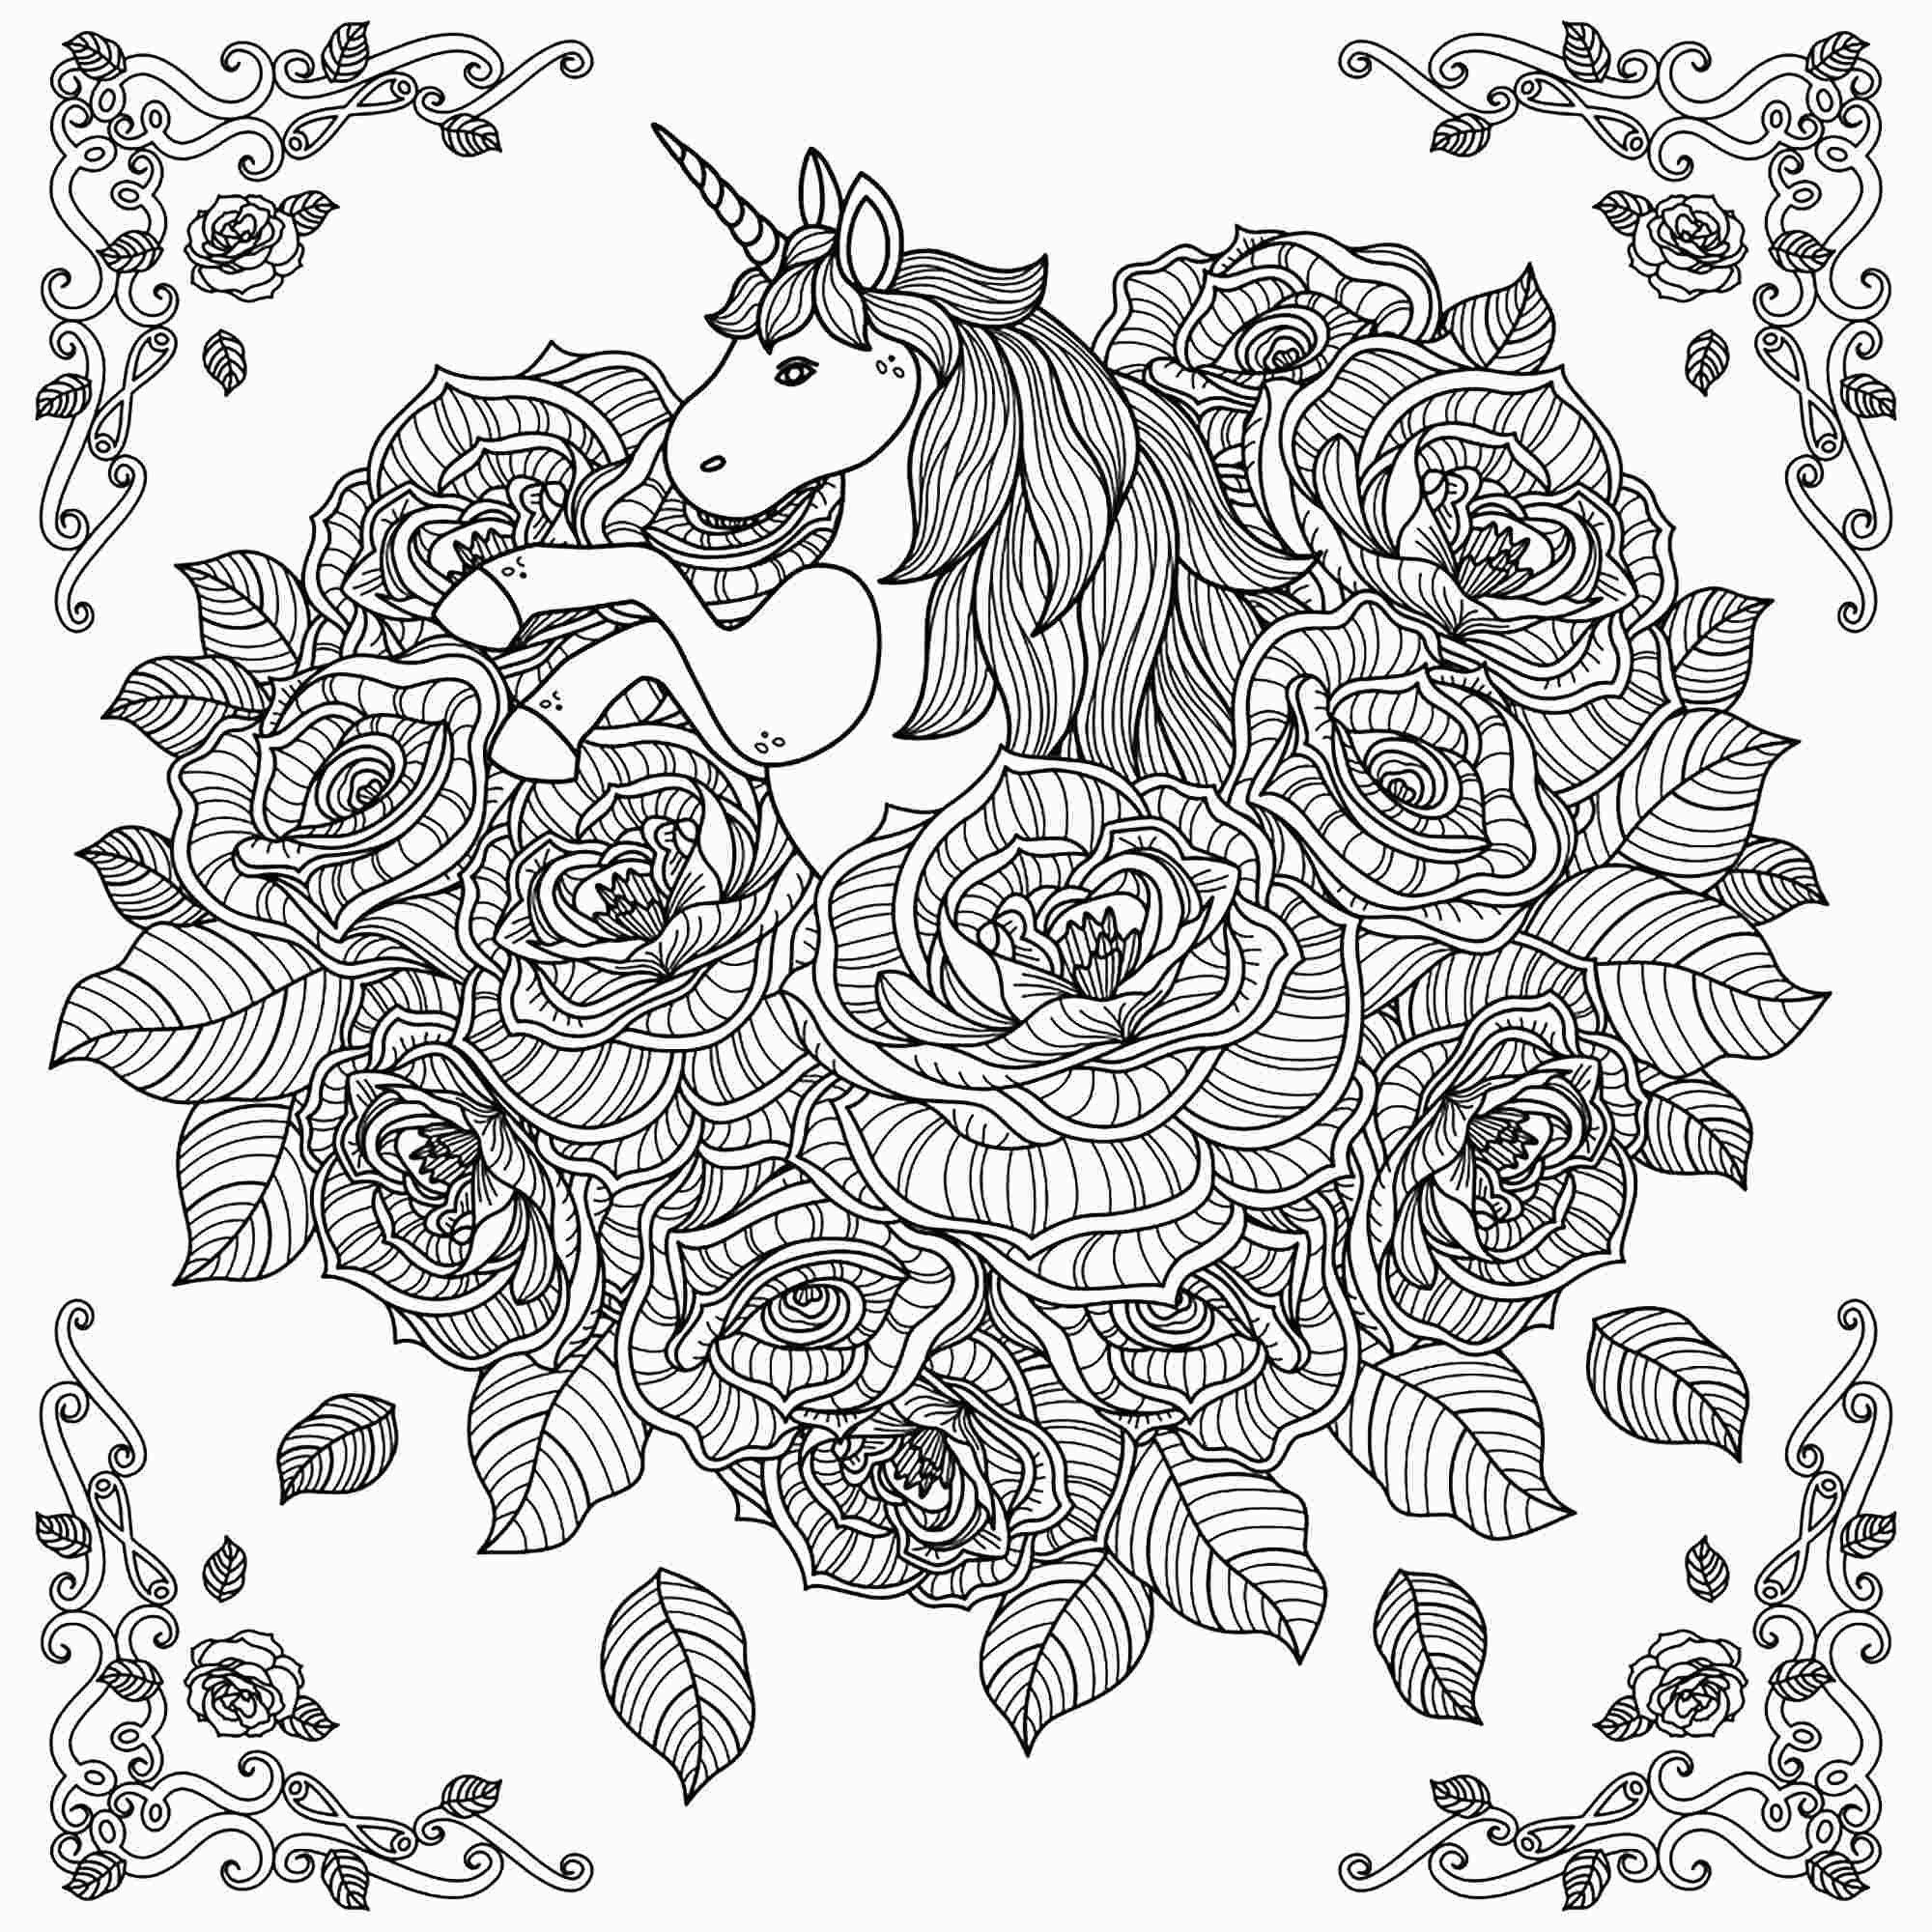 Mandala Coloring Unicorn Unicorn Coloring Pages Mandala Coloring Pages Coloring Pages